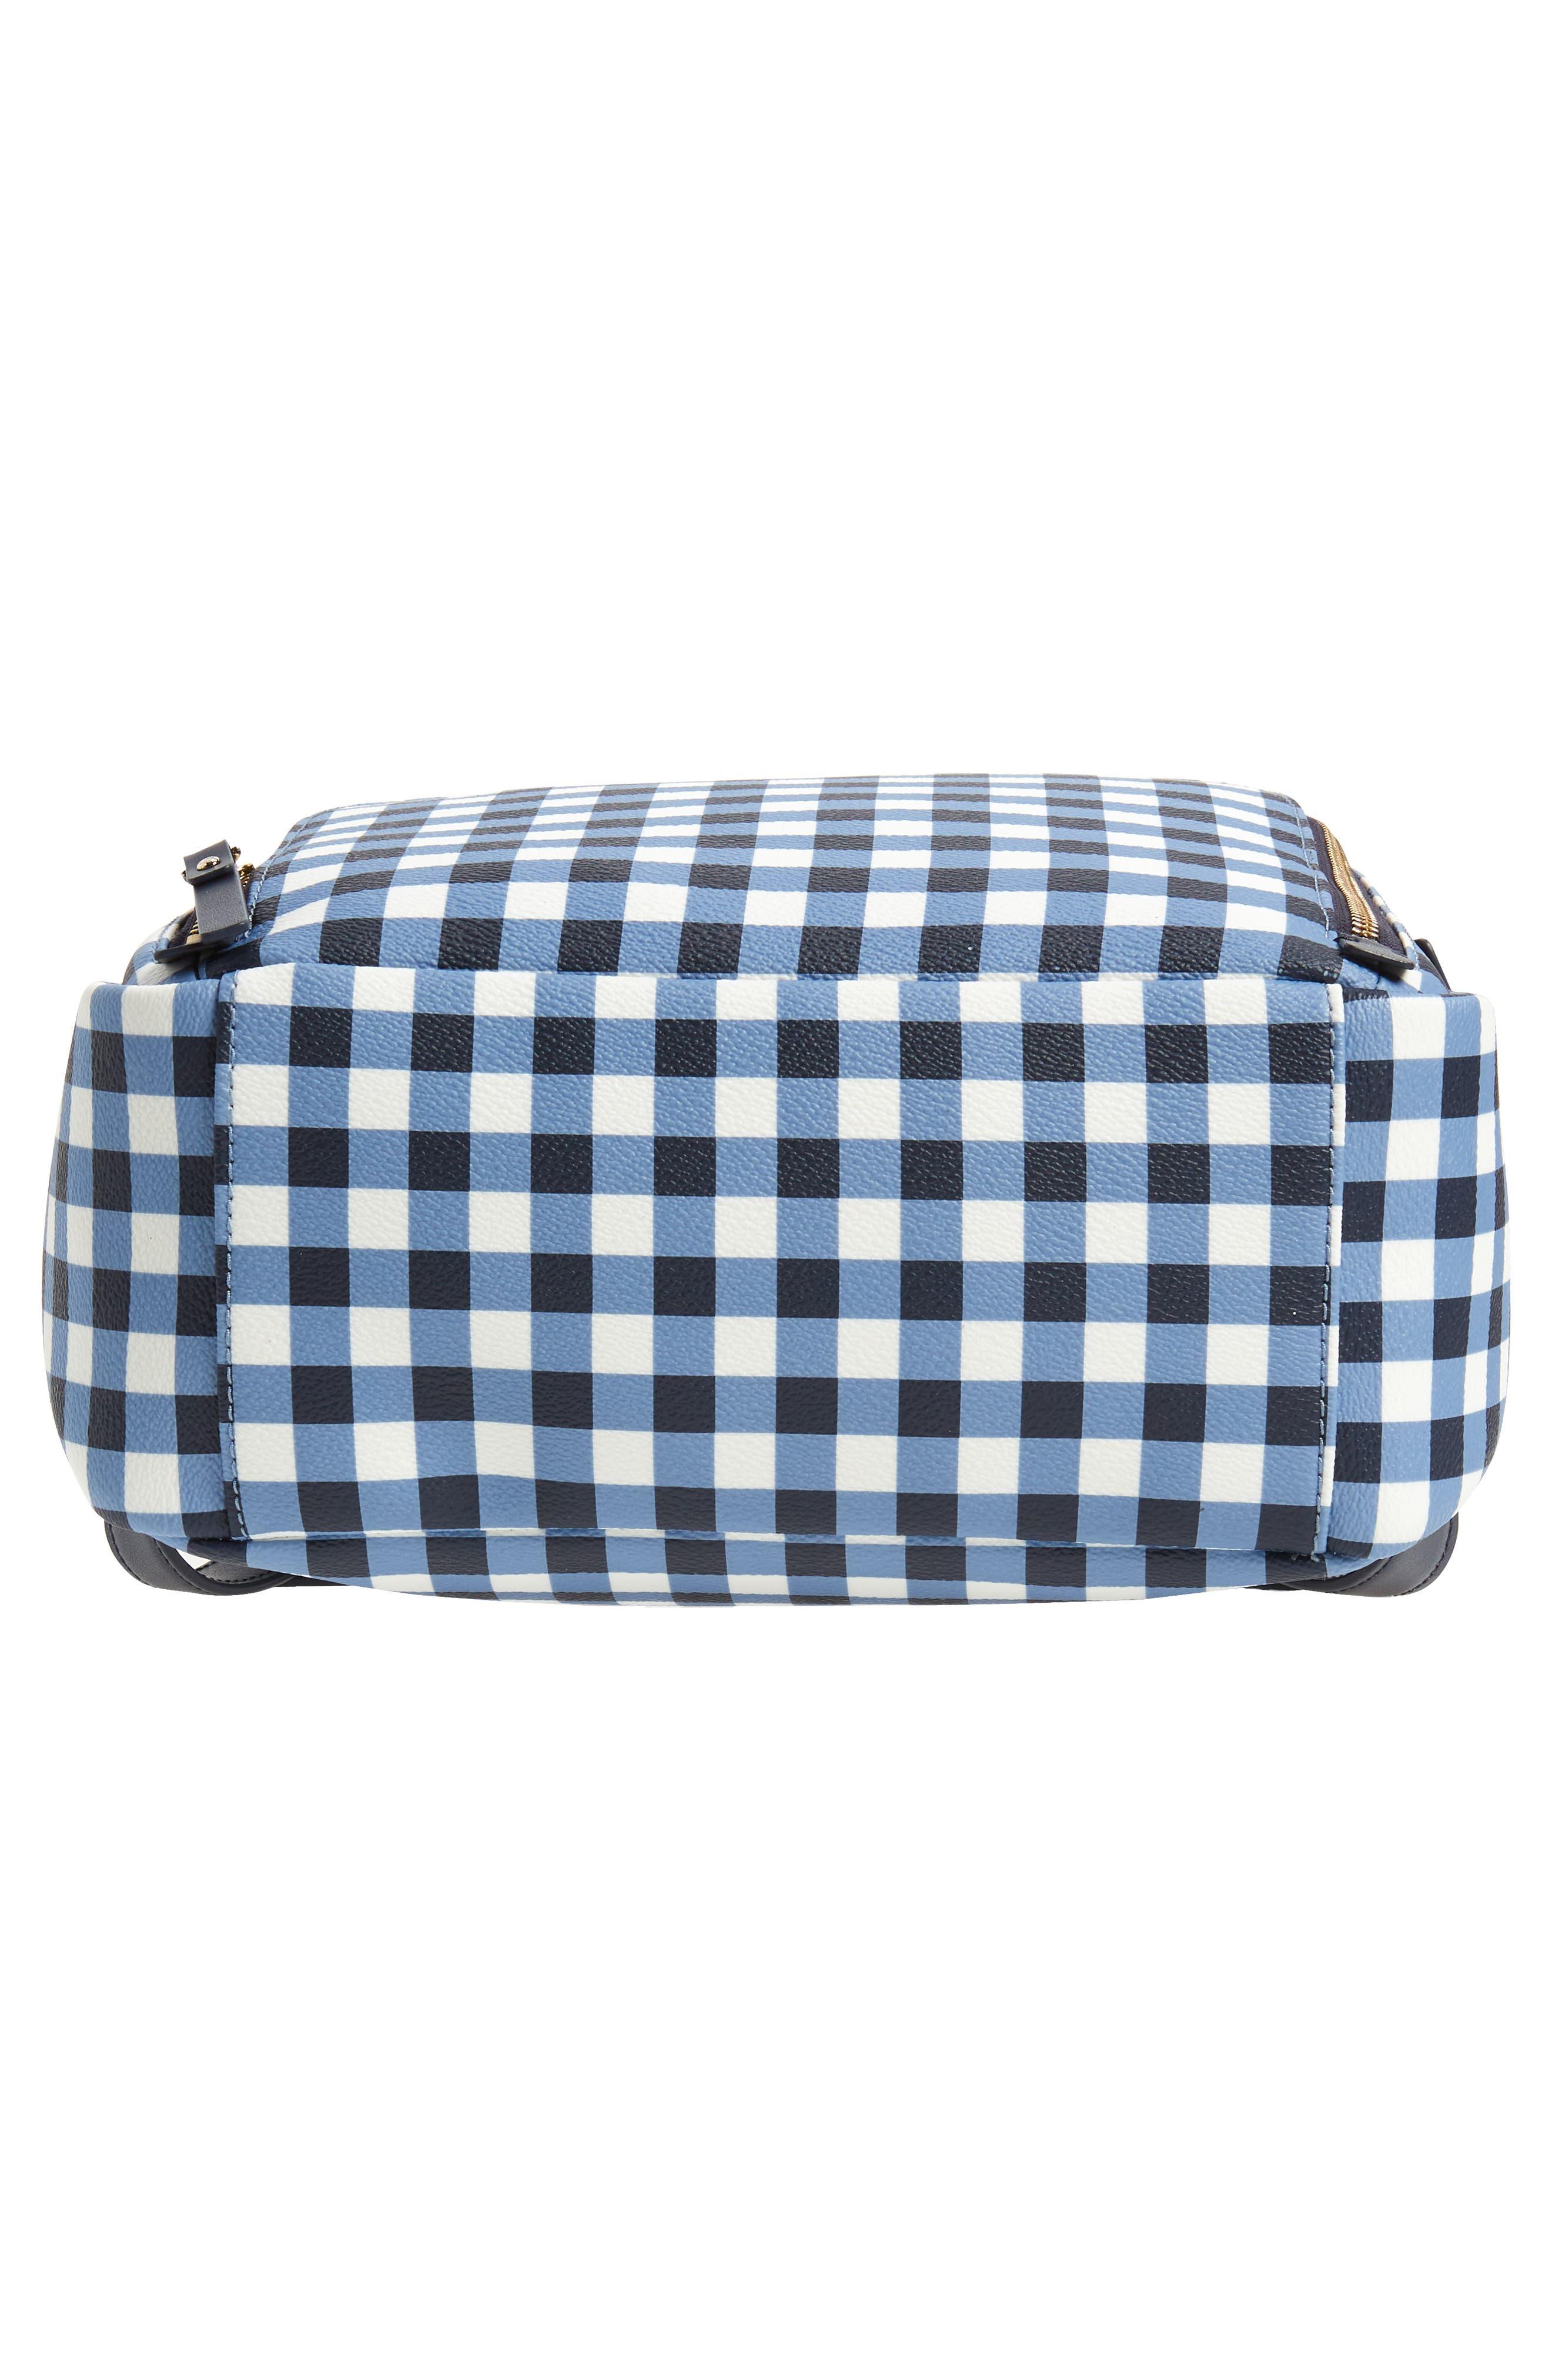 hyde lane hartley gingham backpack,                             Alternate thumbnail 6, color,                             Navy/ White